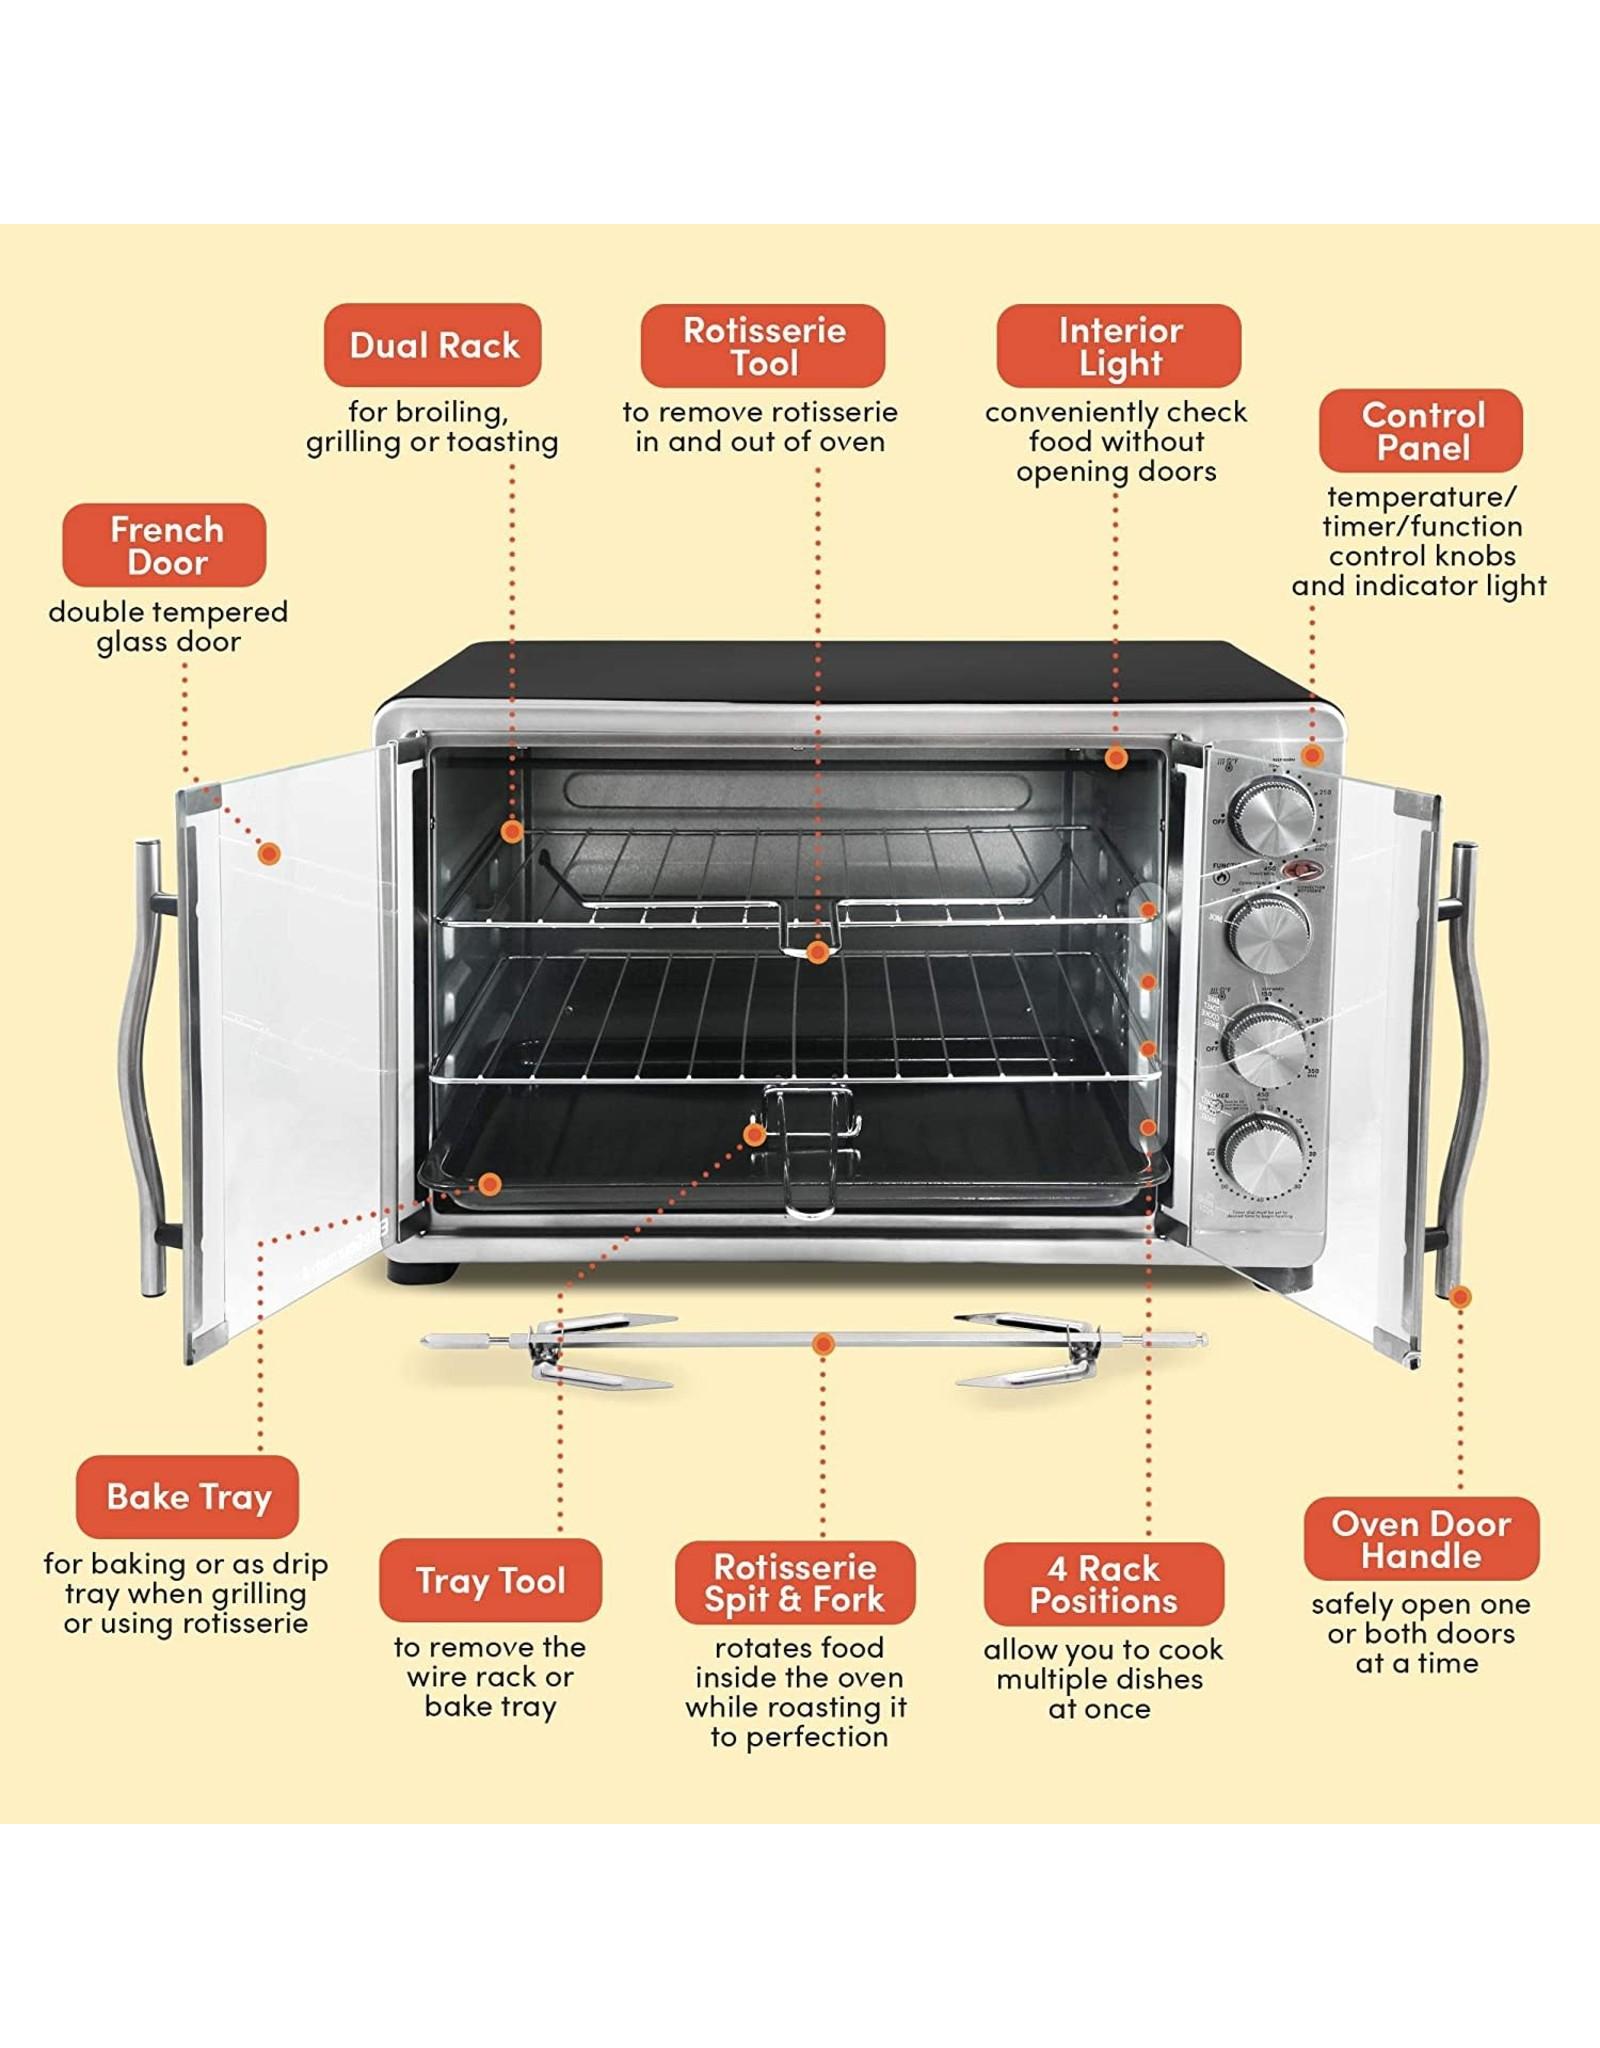 "Elite Gourmet Elite Gourmet ETO-4510M Double French Door Countertop Convection Toaster Oven, Bake Broil Toast Rotisserie Keep Warm 12""-14"" pizza 2 Racks, 18-Slice, 45 L, Stainless Steel & Black"